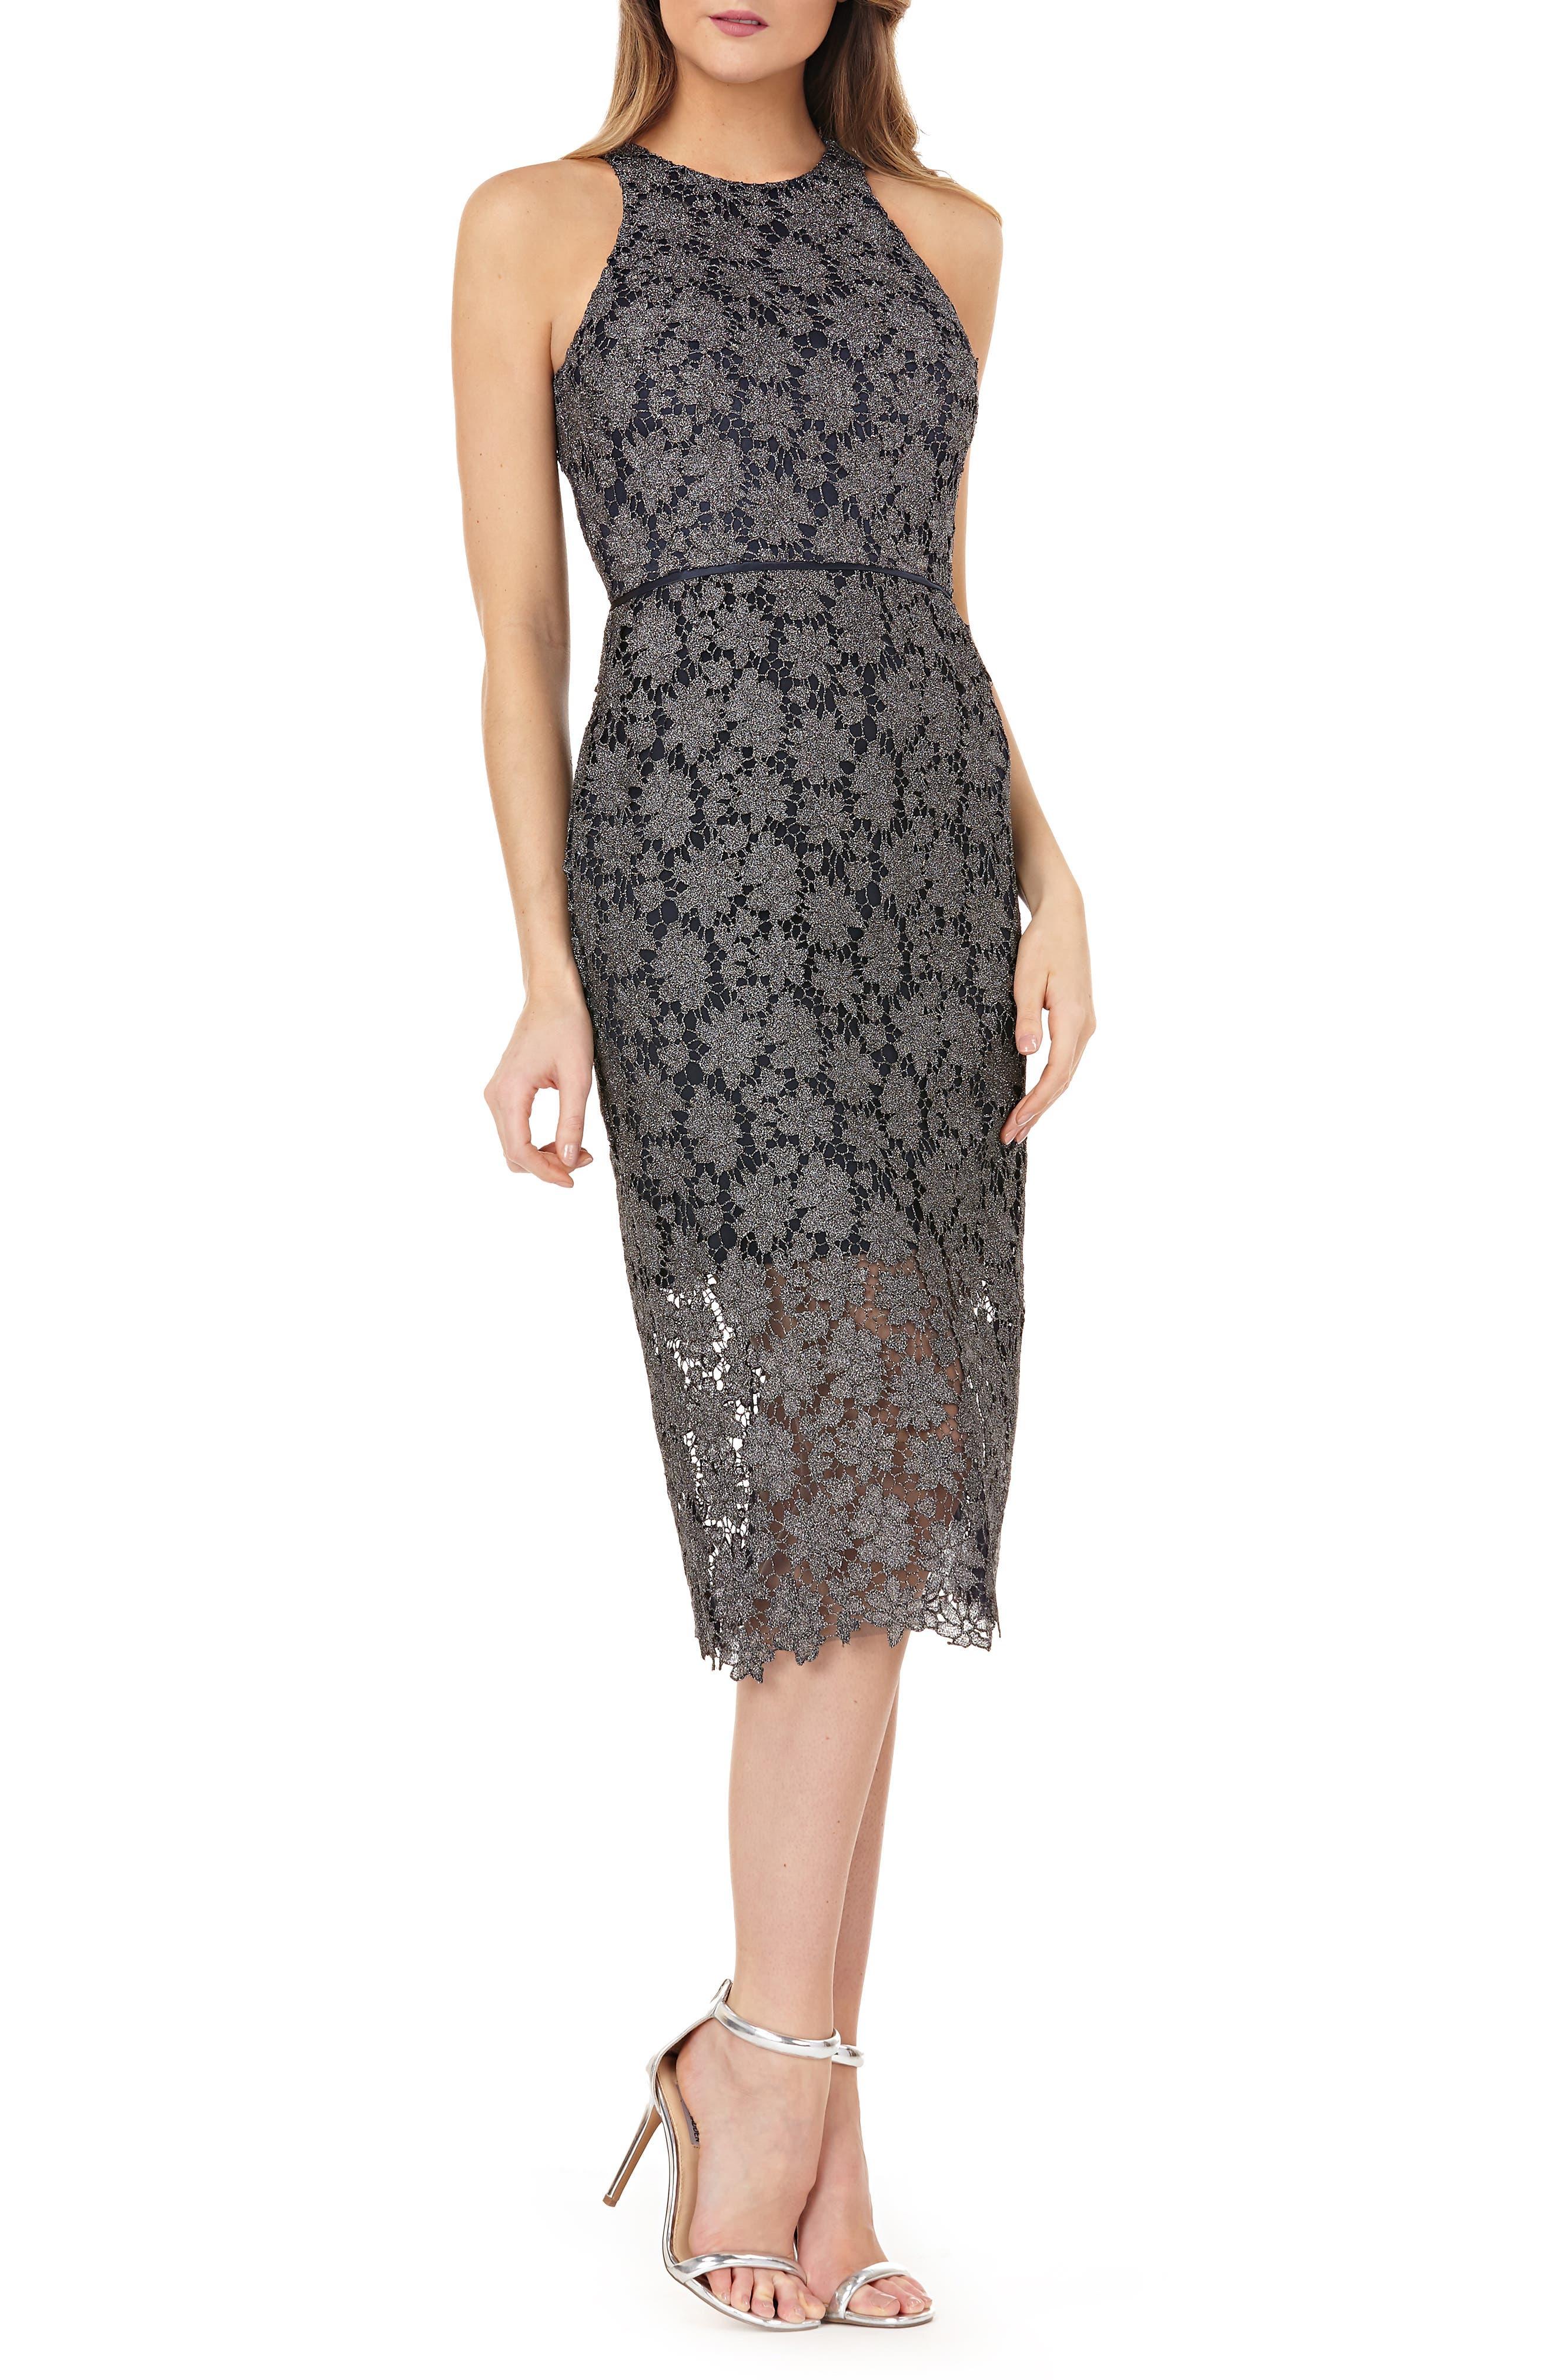 Js Collections Metallic Lace Midi Sheath Dress, Grey